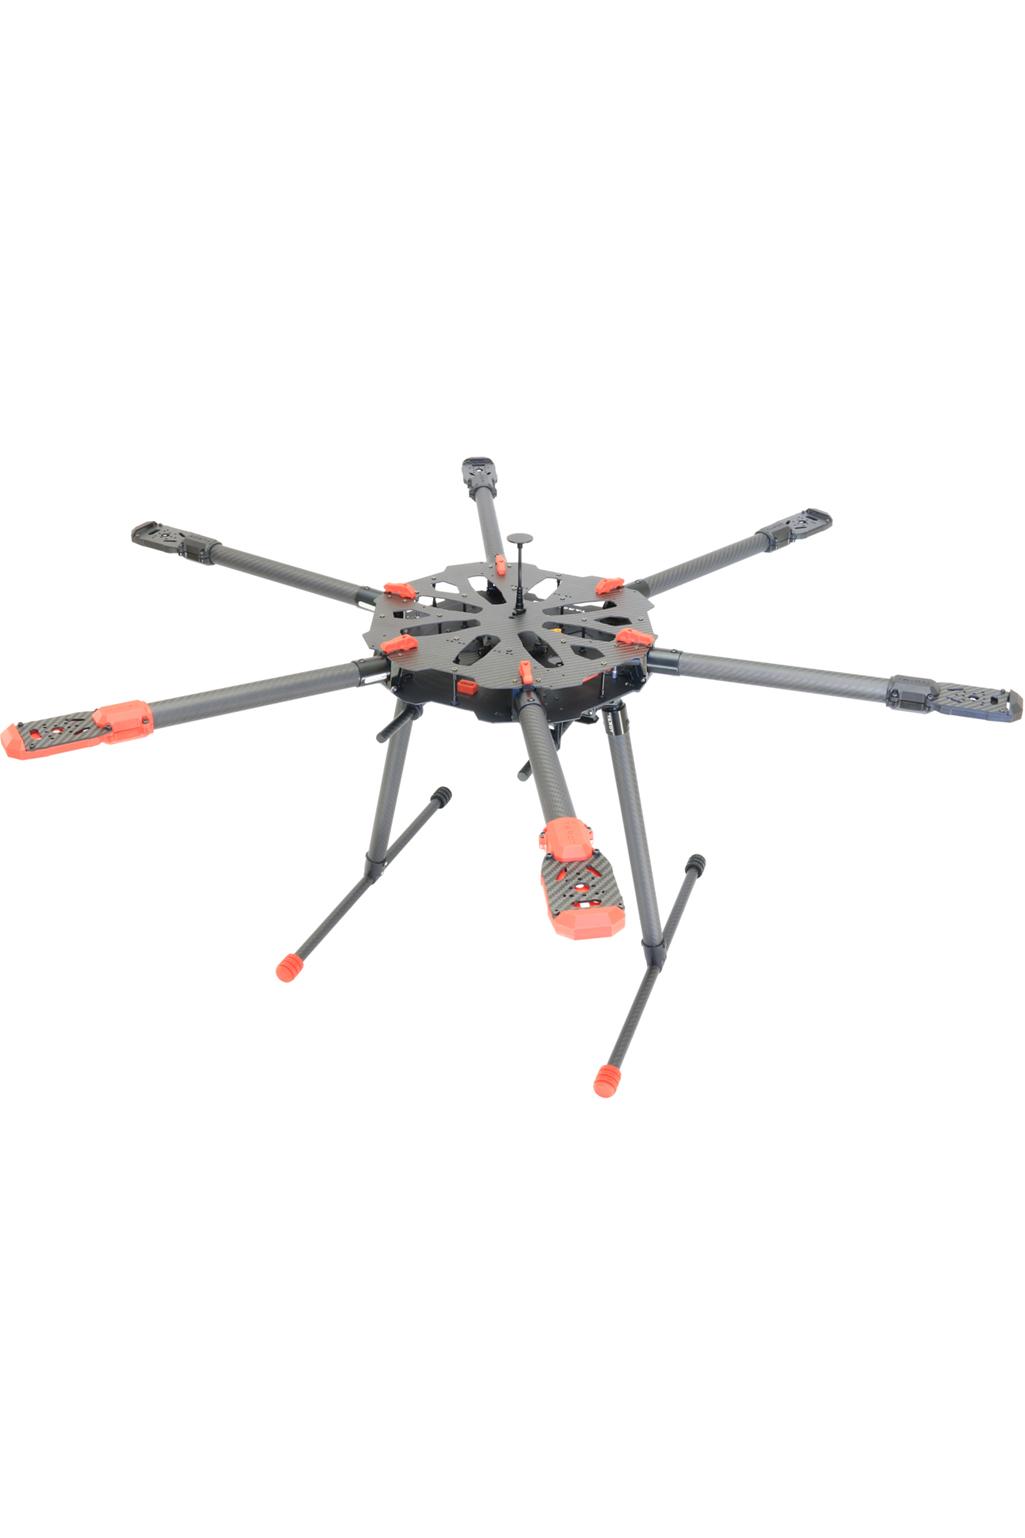 Tarot X6 690mm Carbon Fibre Foldable Hexacopter Frame